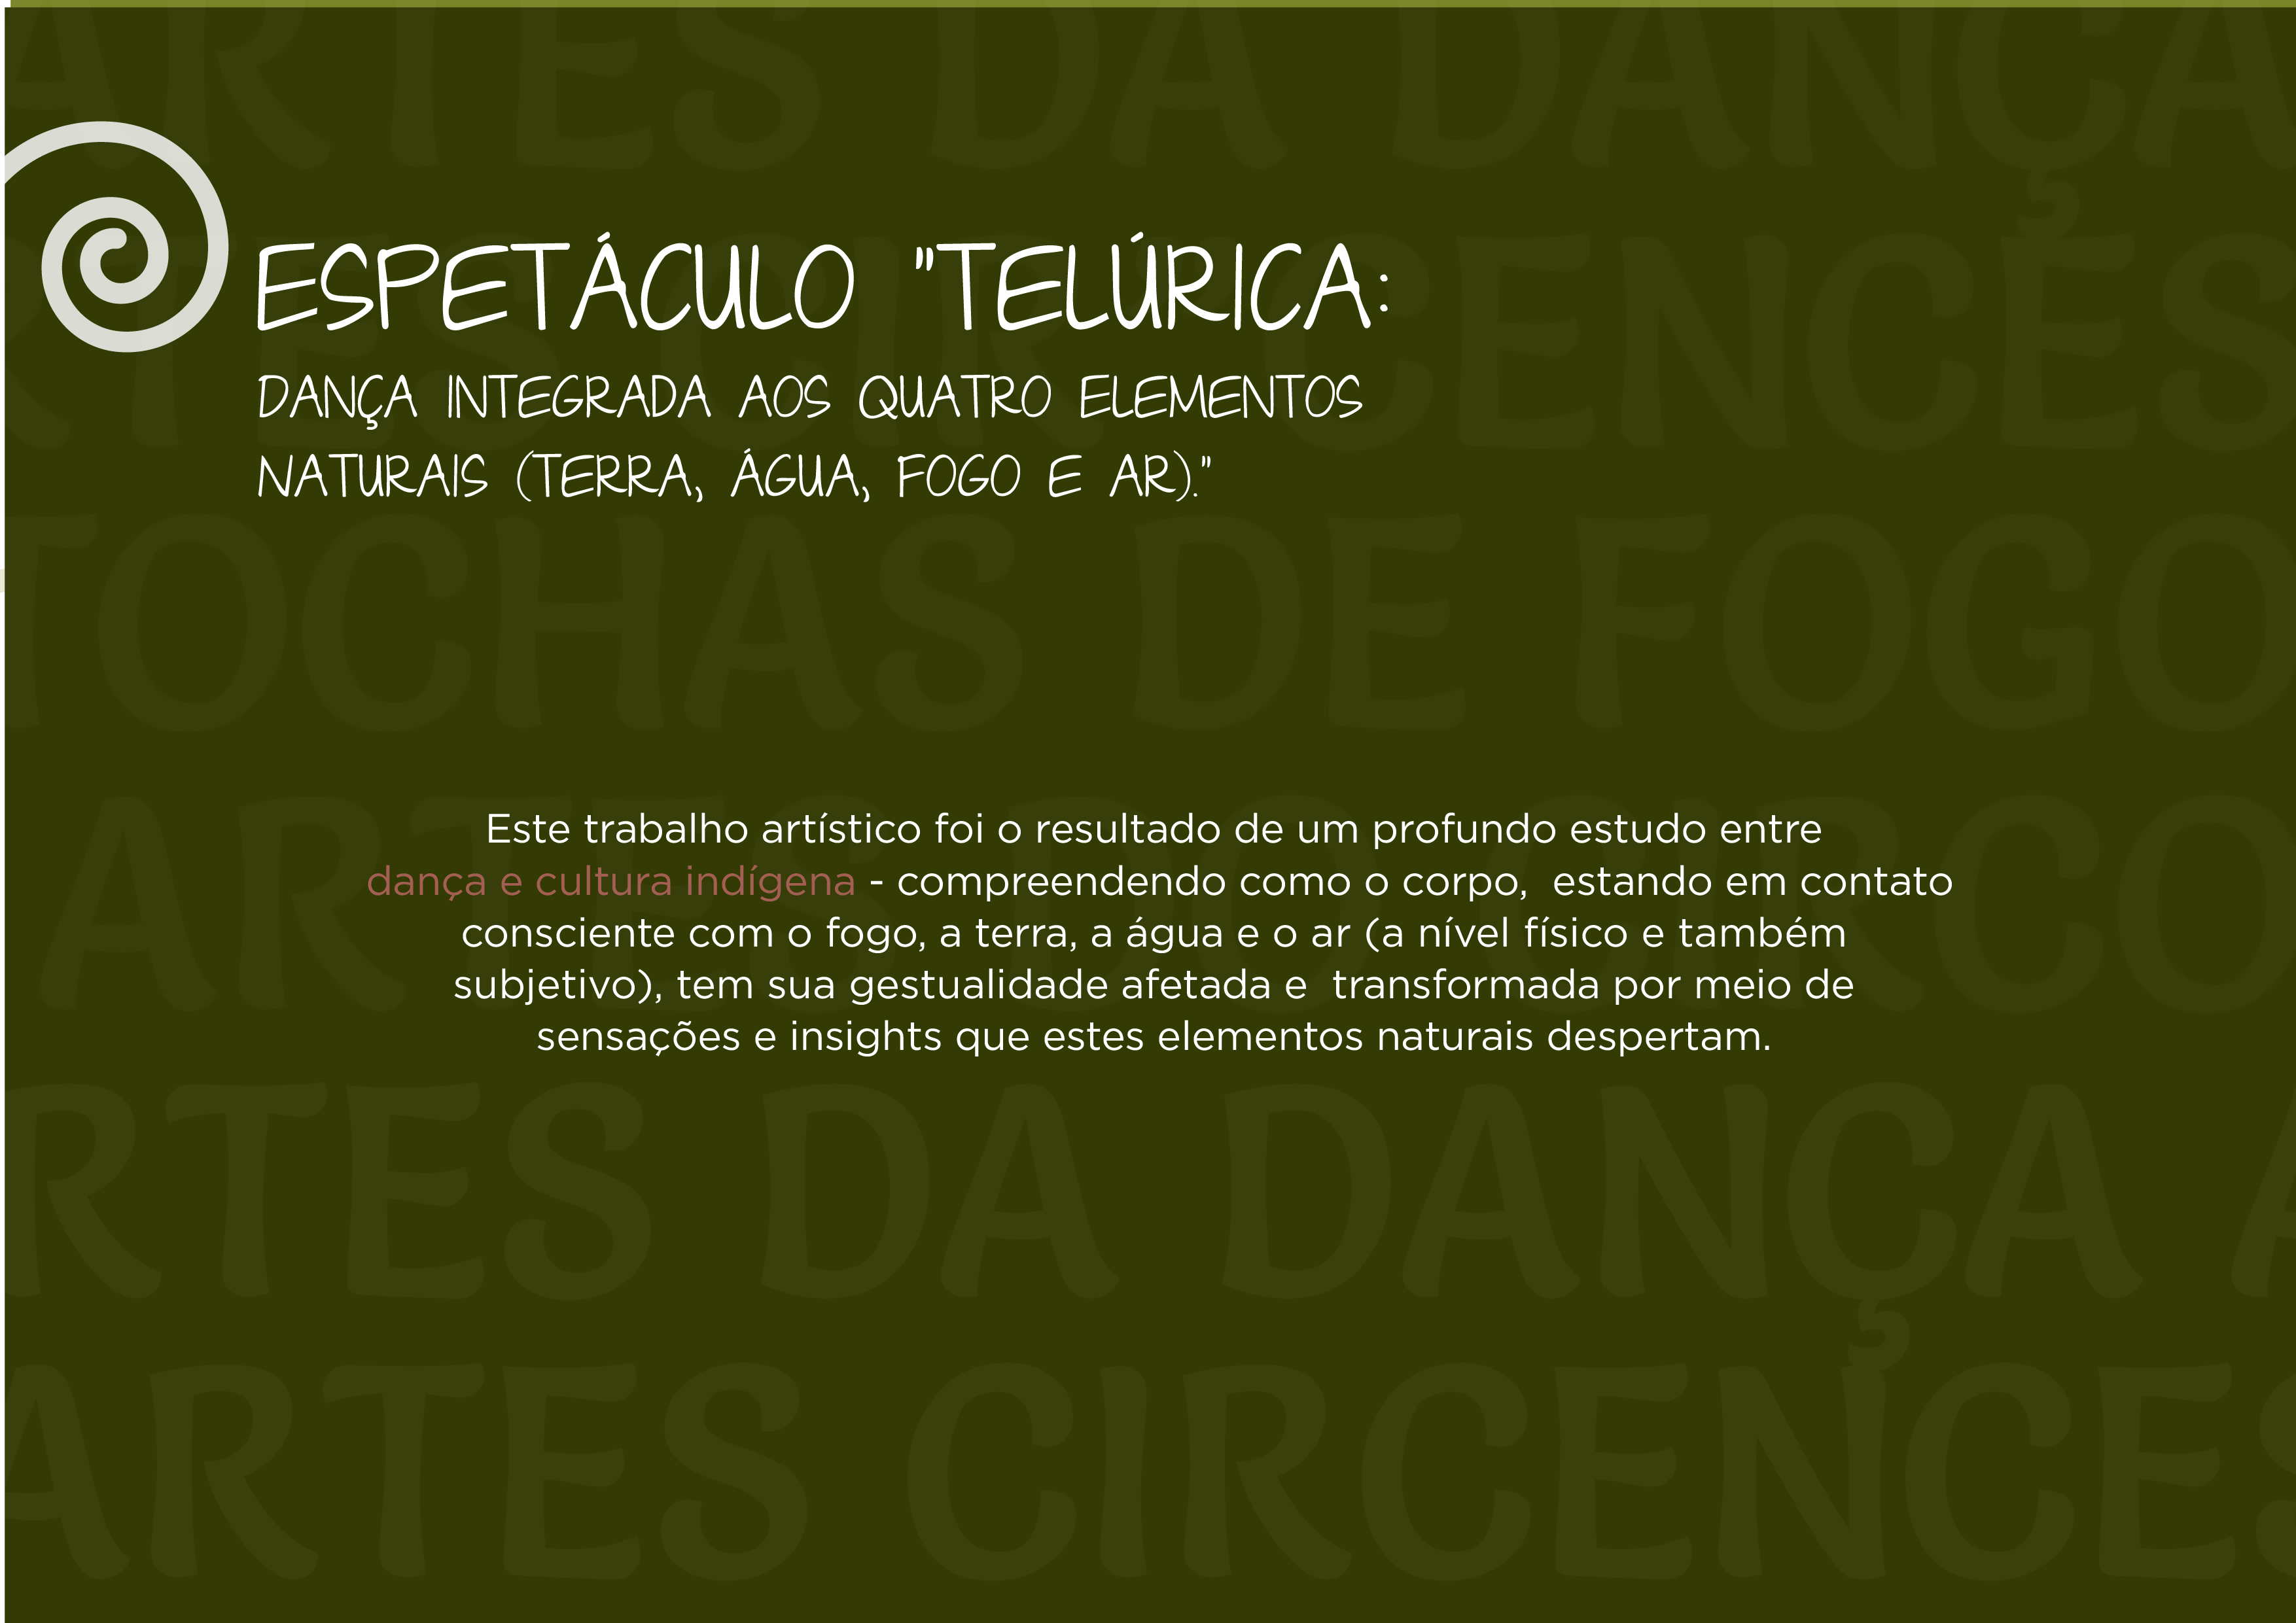 Portifolio Silvia Artista - entrega okk 22.11_Prancheta 1 cópia 4_Prancheta 1 cópia 4